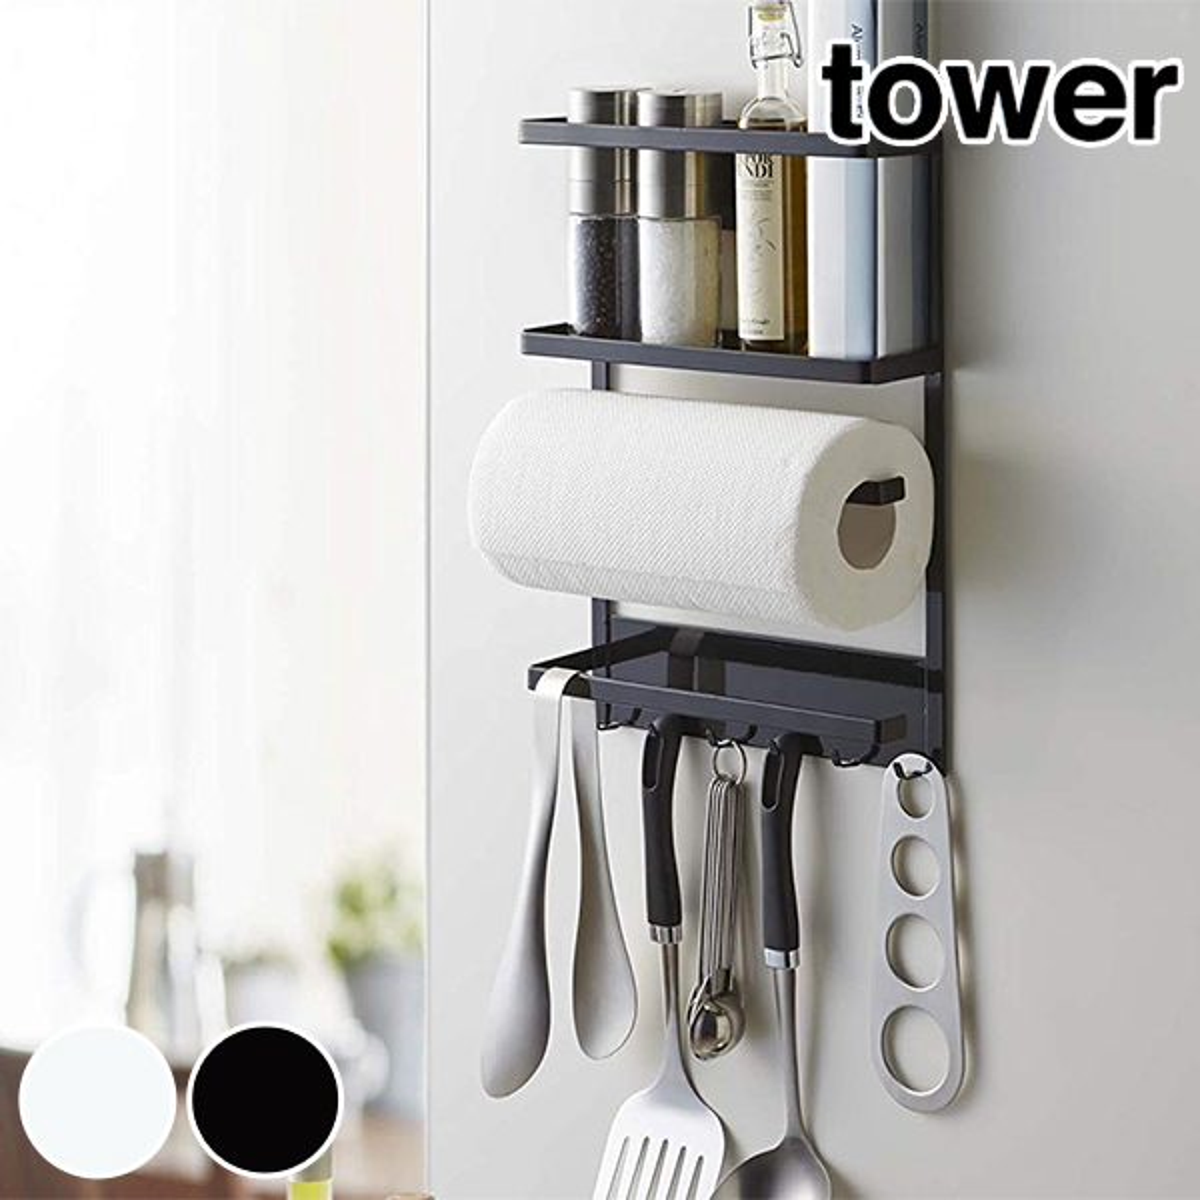 kitchen tool holder decorative trash cans livingut 廚房工具架塔塔冰箱側機架磁鋼 磁鐵廚房存儲工裝冰箱側磁鐵式 磁鐵廚房存儲工裝